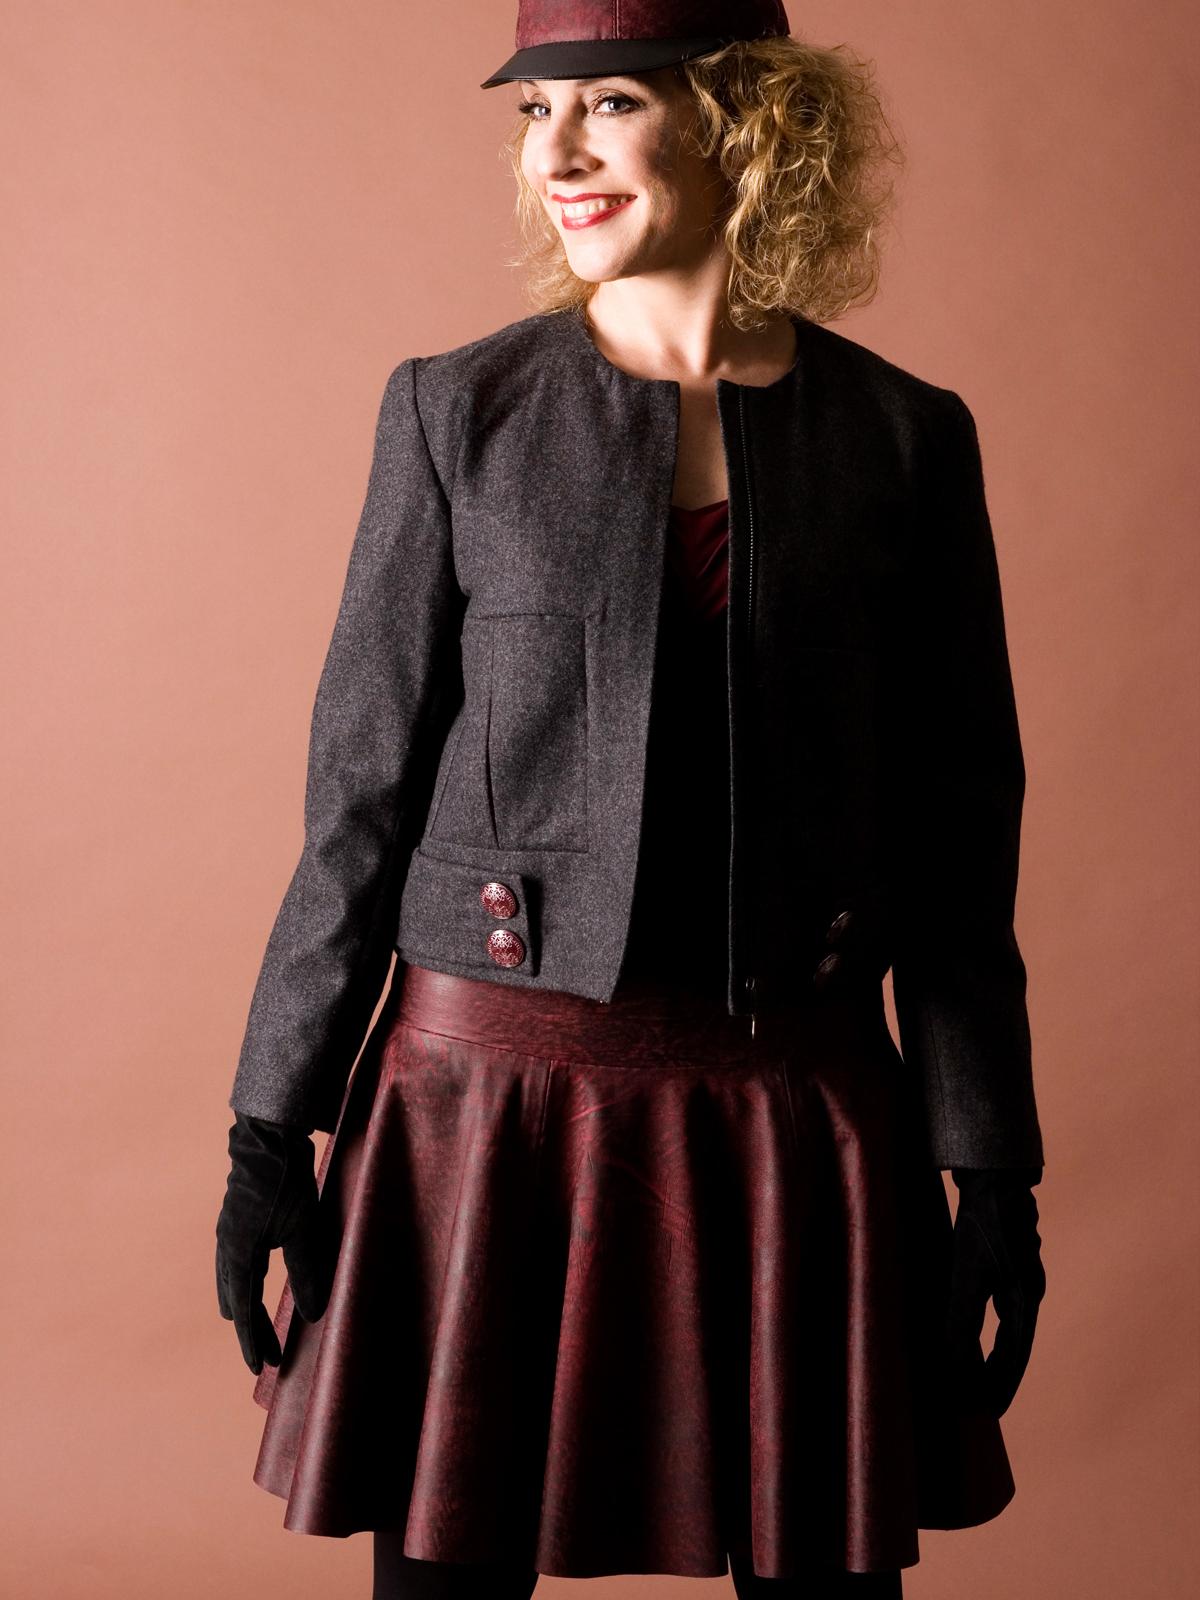 Jana Minarikova Collection Fall/Winter 2014